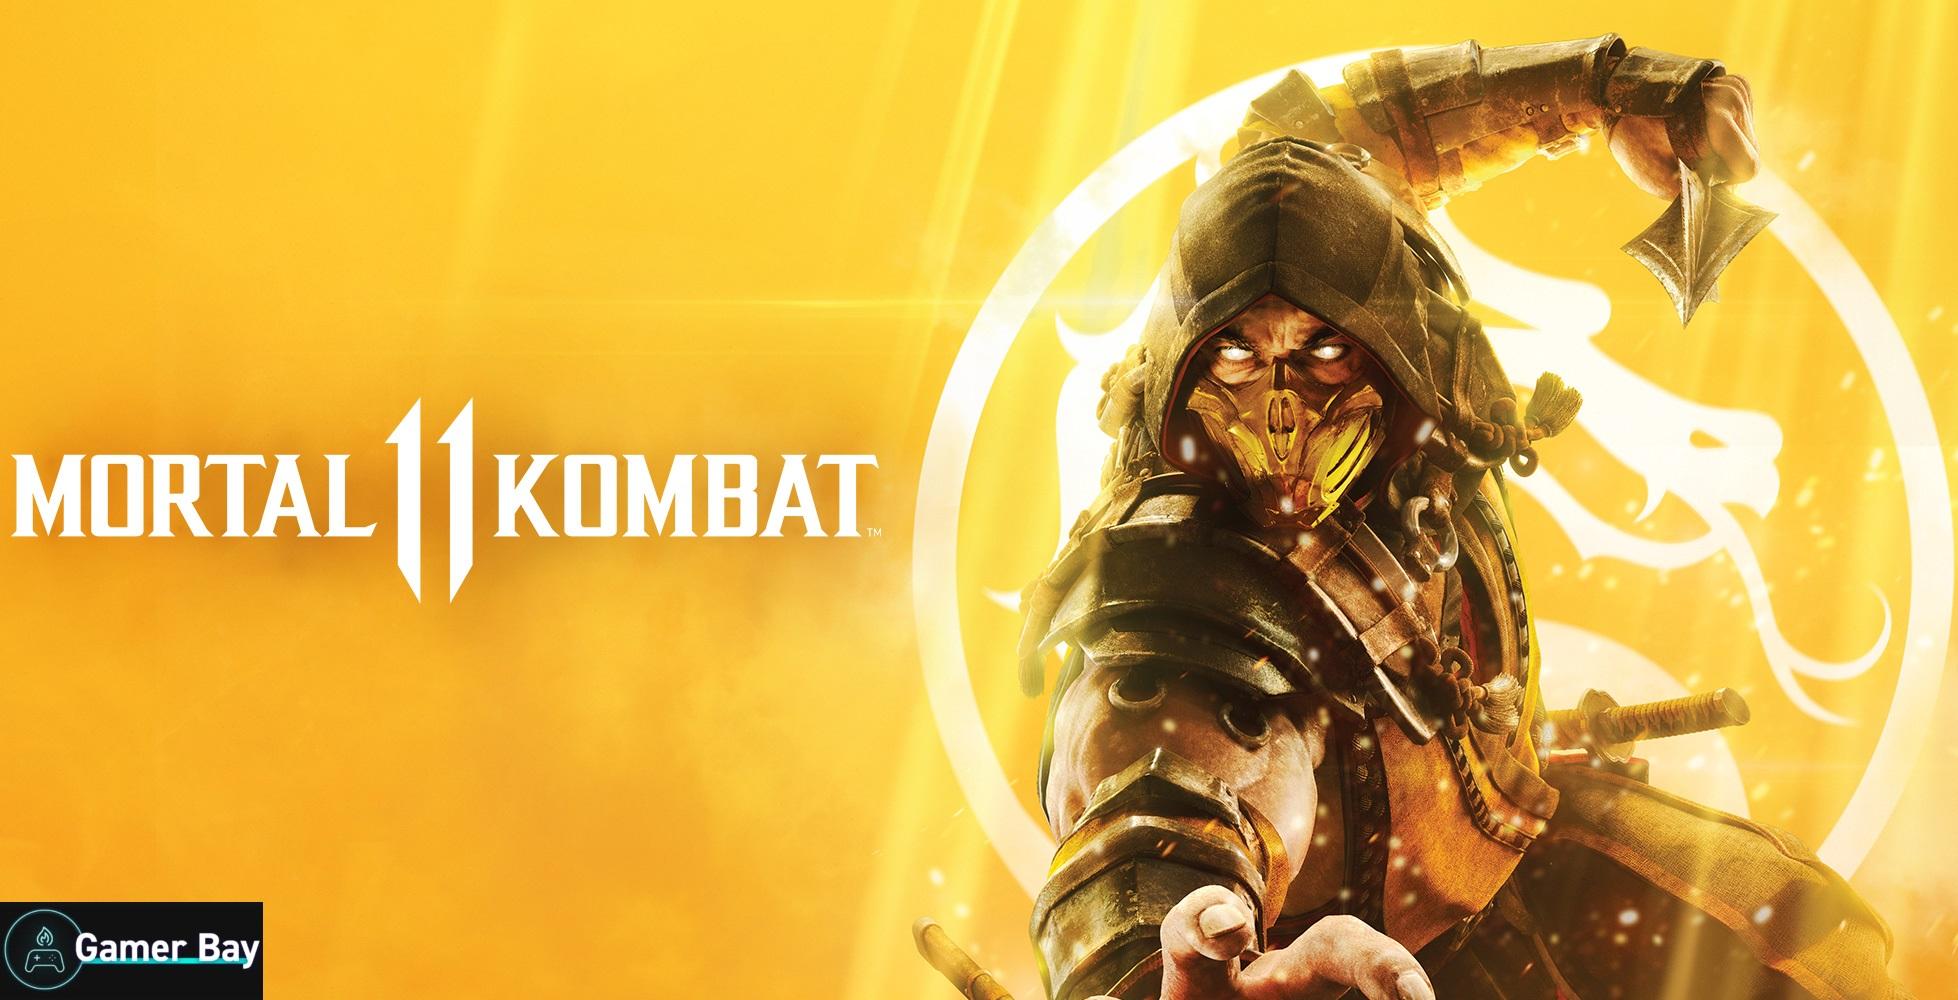 Утечка раскрыла бойцов MK 11 из Kombat Pass 2